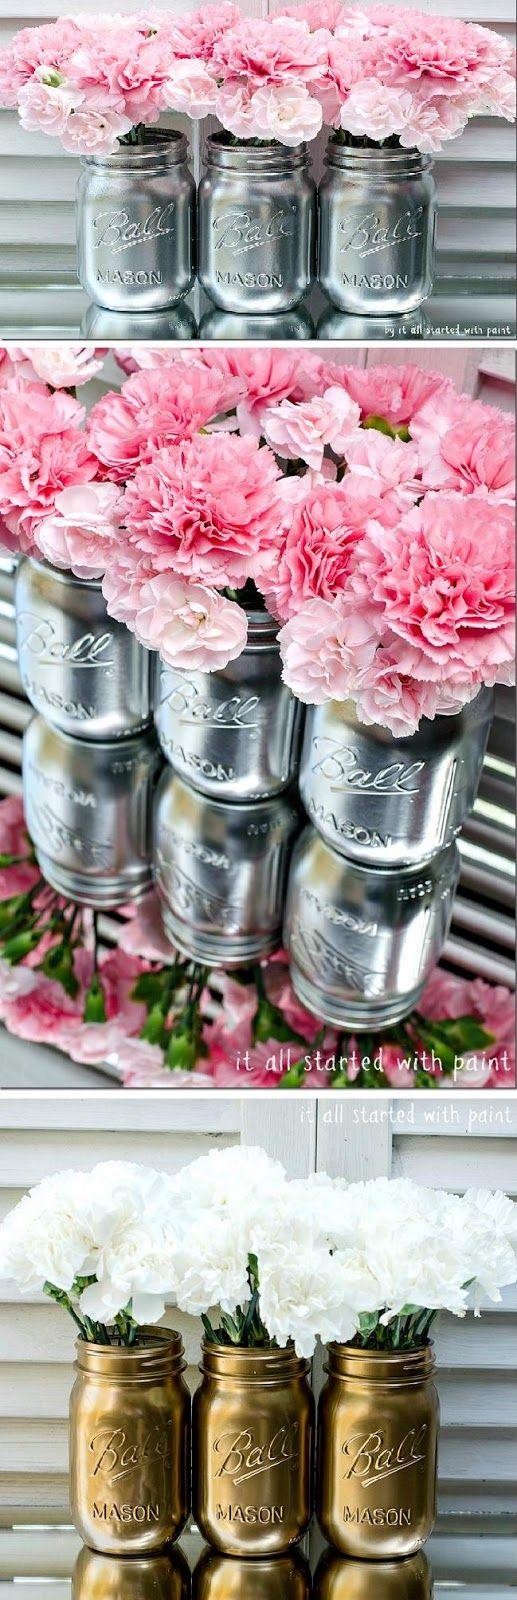 Pink flowers and white roses - Metallic painted mason jars!